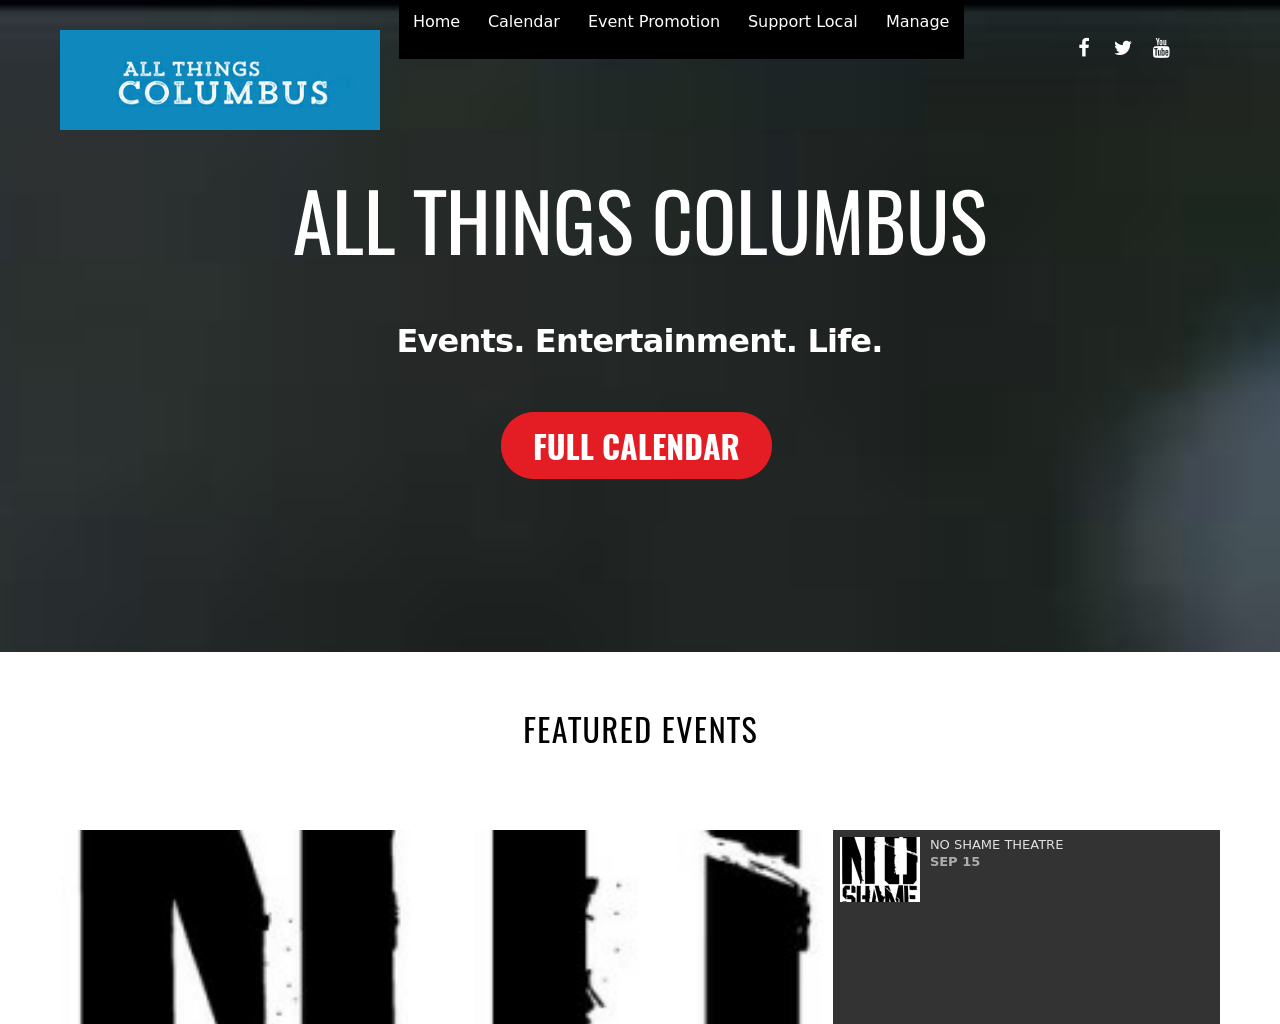 All-Things-Columbus-Advertising-Reviews-Pricing